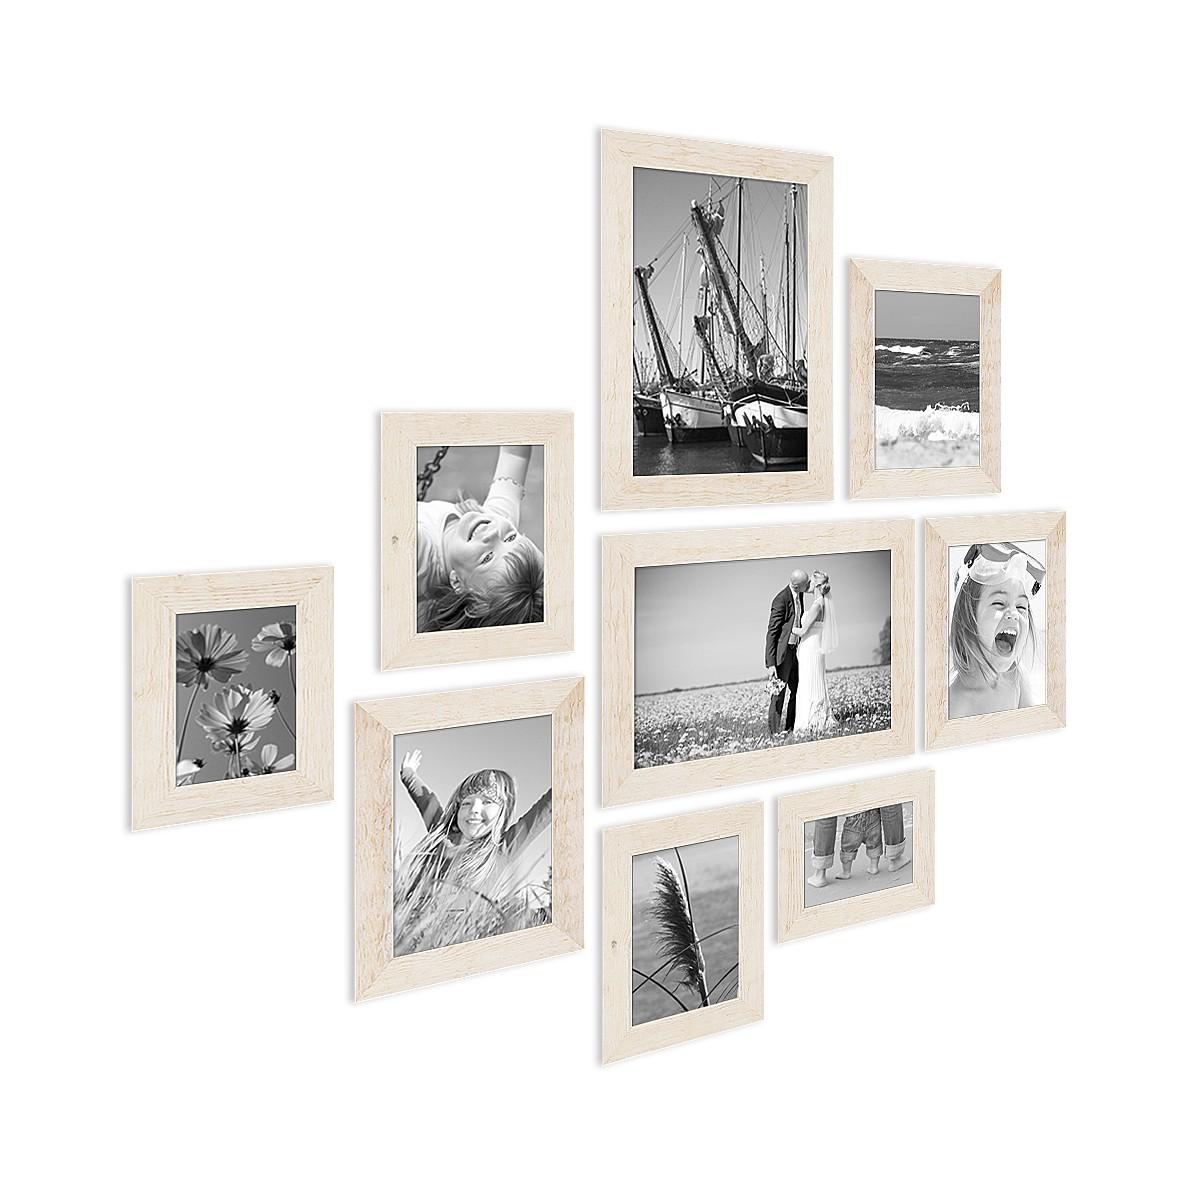 9er bilderrahmen set strandhaus rustikal weiss massivholz 10x15 bis 20x30 cm inkl zubeh r zur. Black Bedroom Furniture Sets. Home Design Ideas